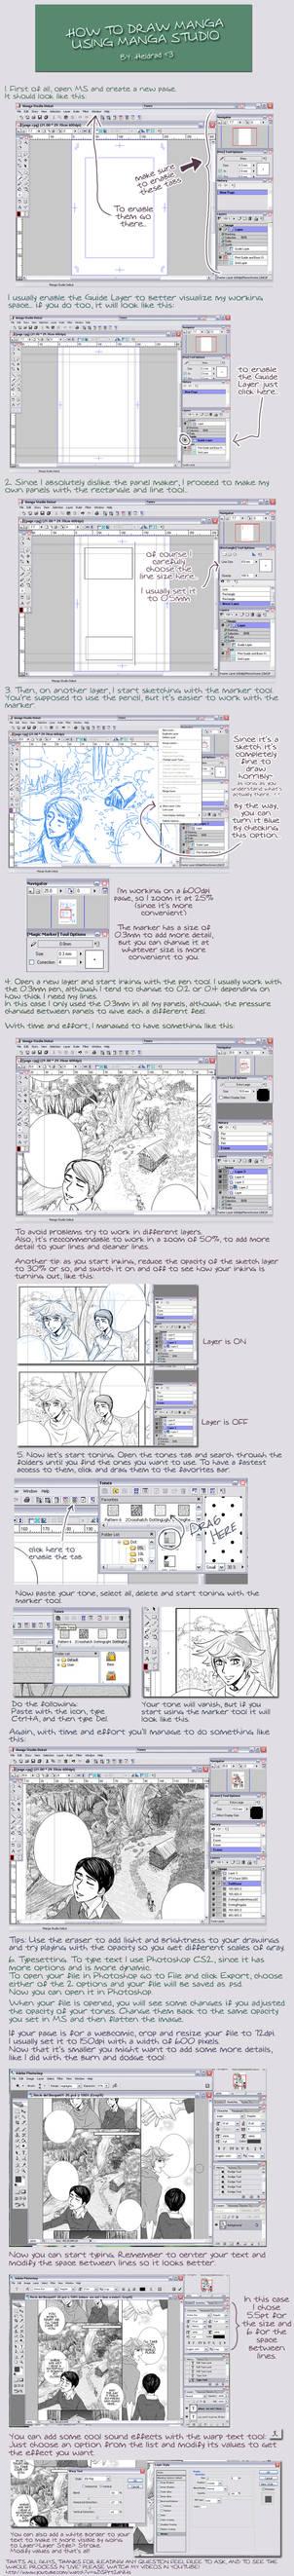 manga studio tutorial by Heldrad